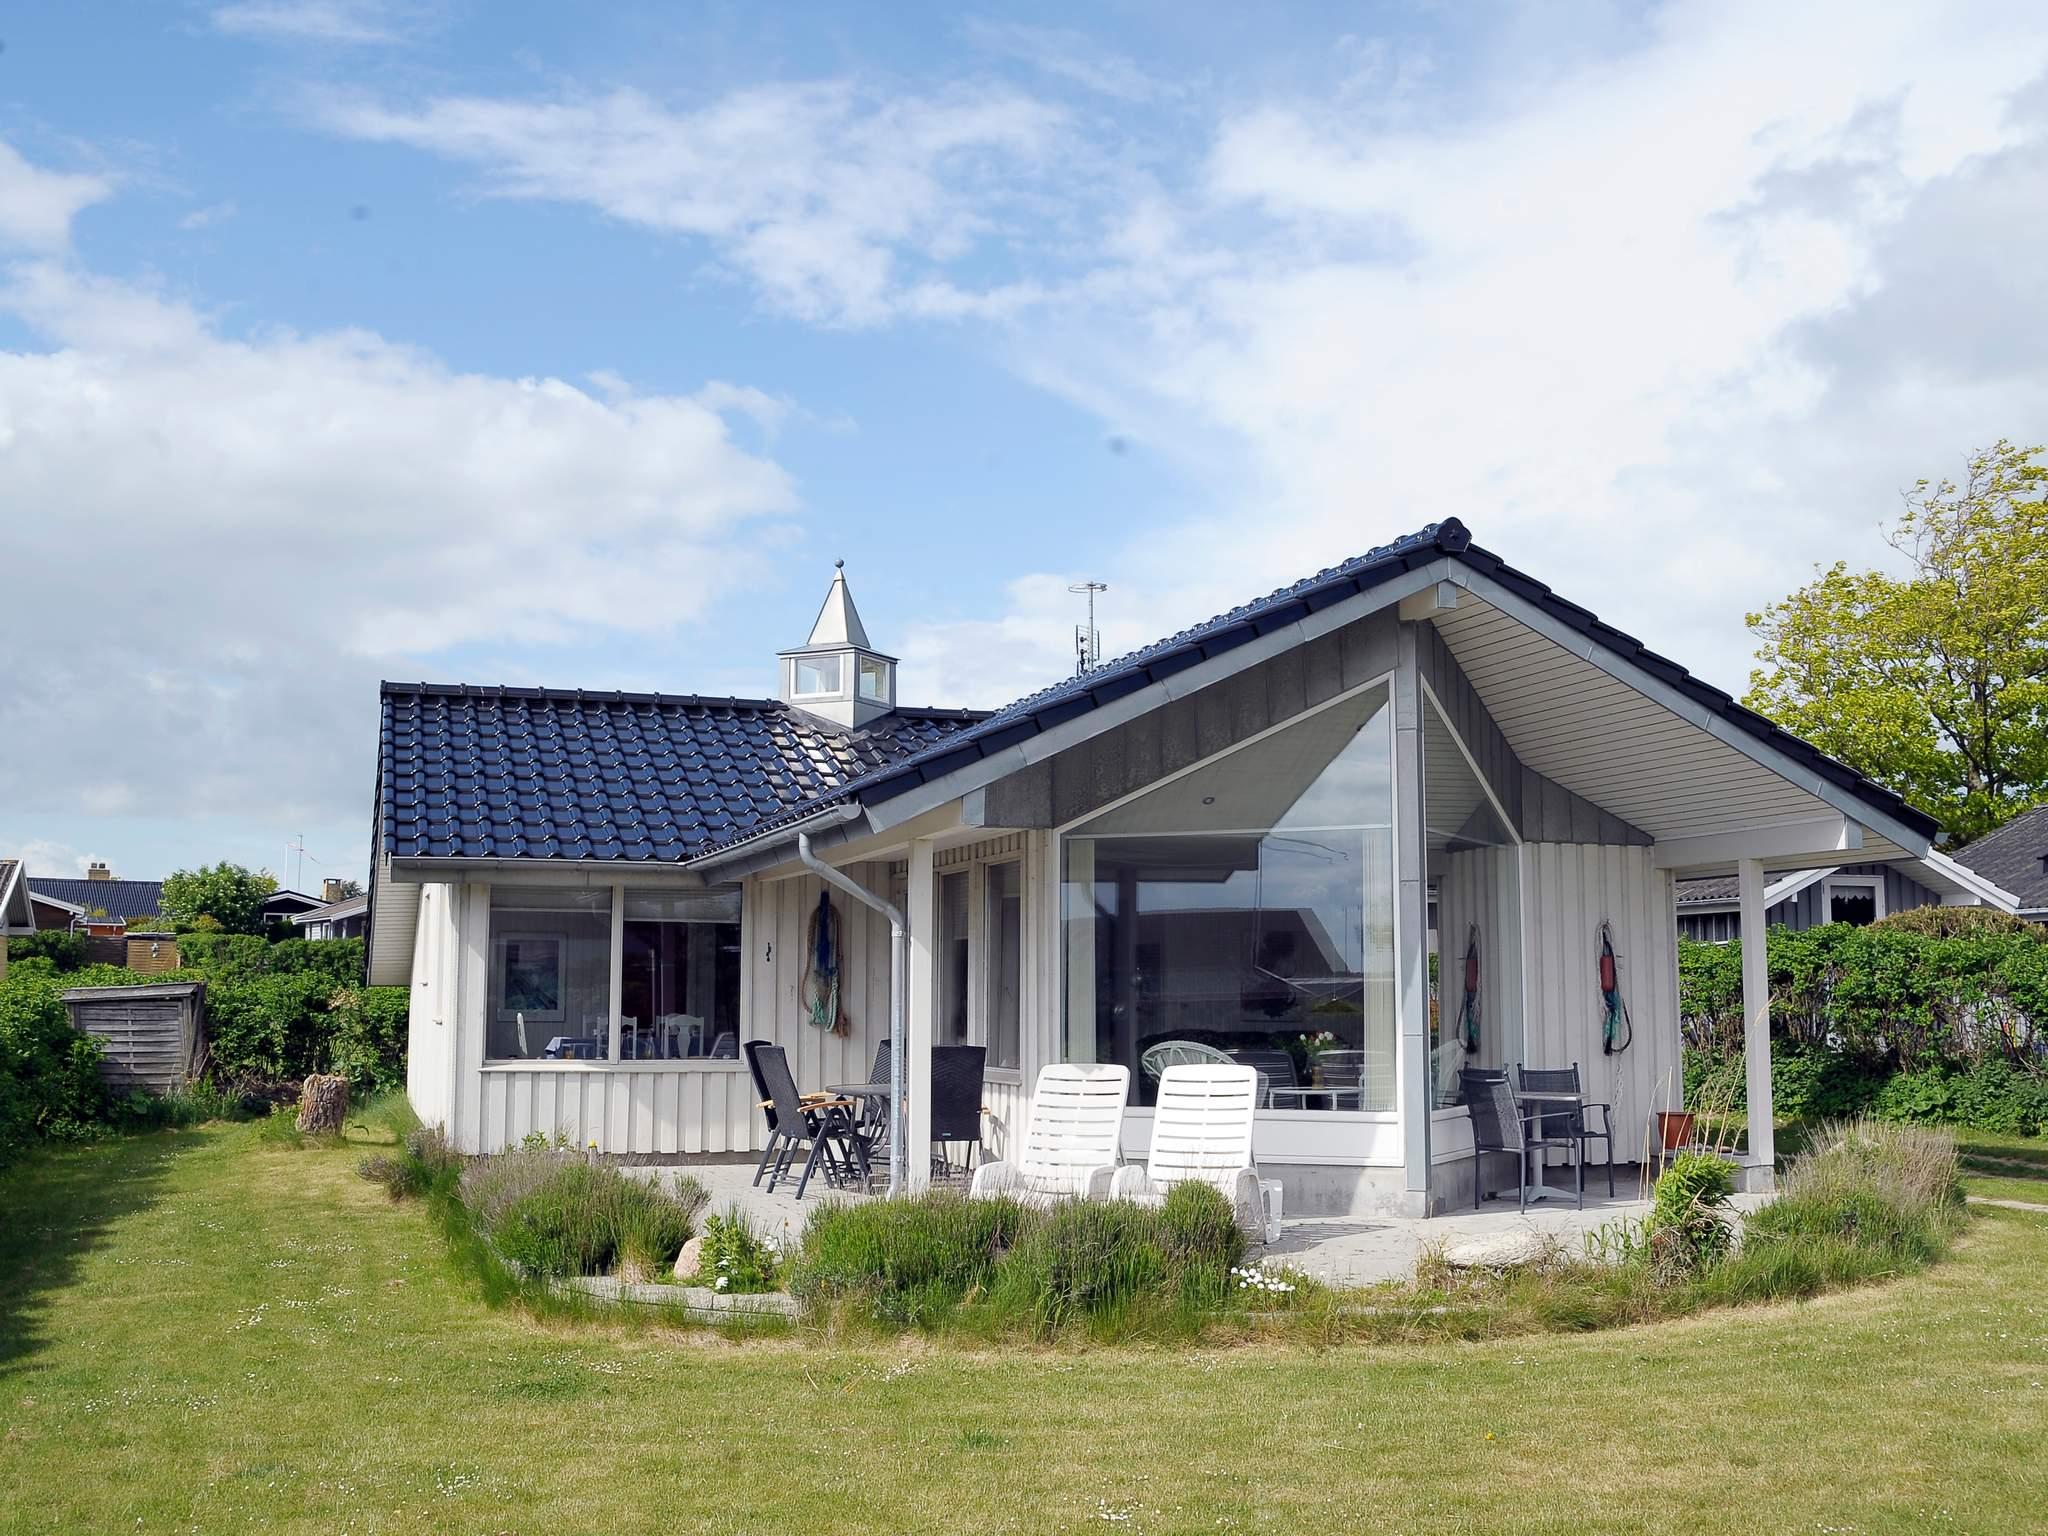 Ferienhaus Dyreborg (440378), Dyreborg, , Fünen, Dänemark, Bild 1